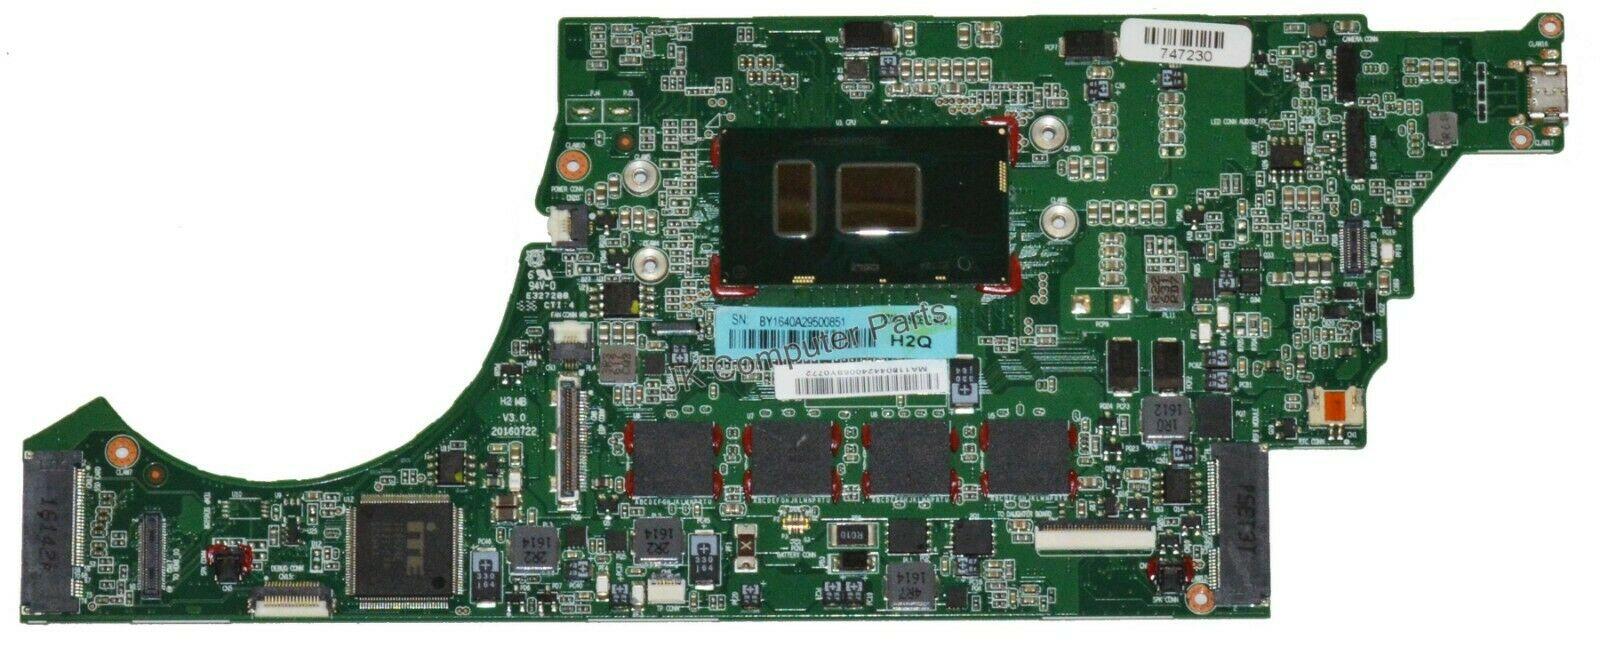 "Razer Blade Stealth 12.5/"" Intel i7-7500U 2.7GHz 16GB Motherboard RZ09-01962"